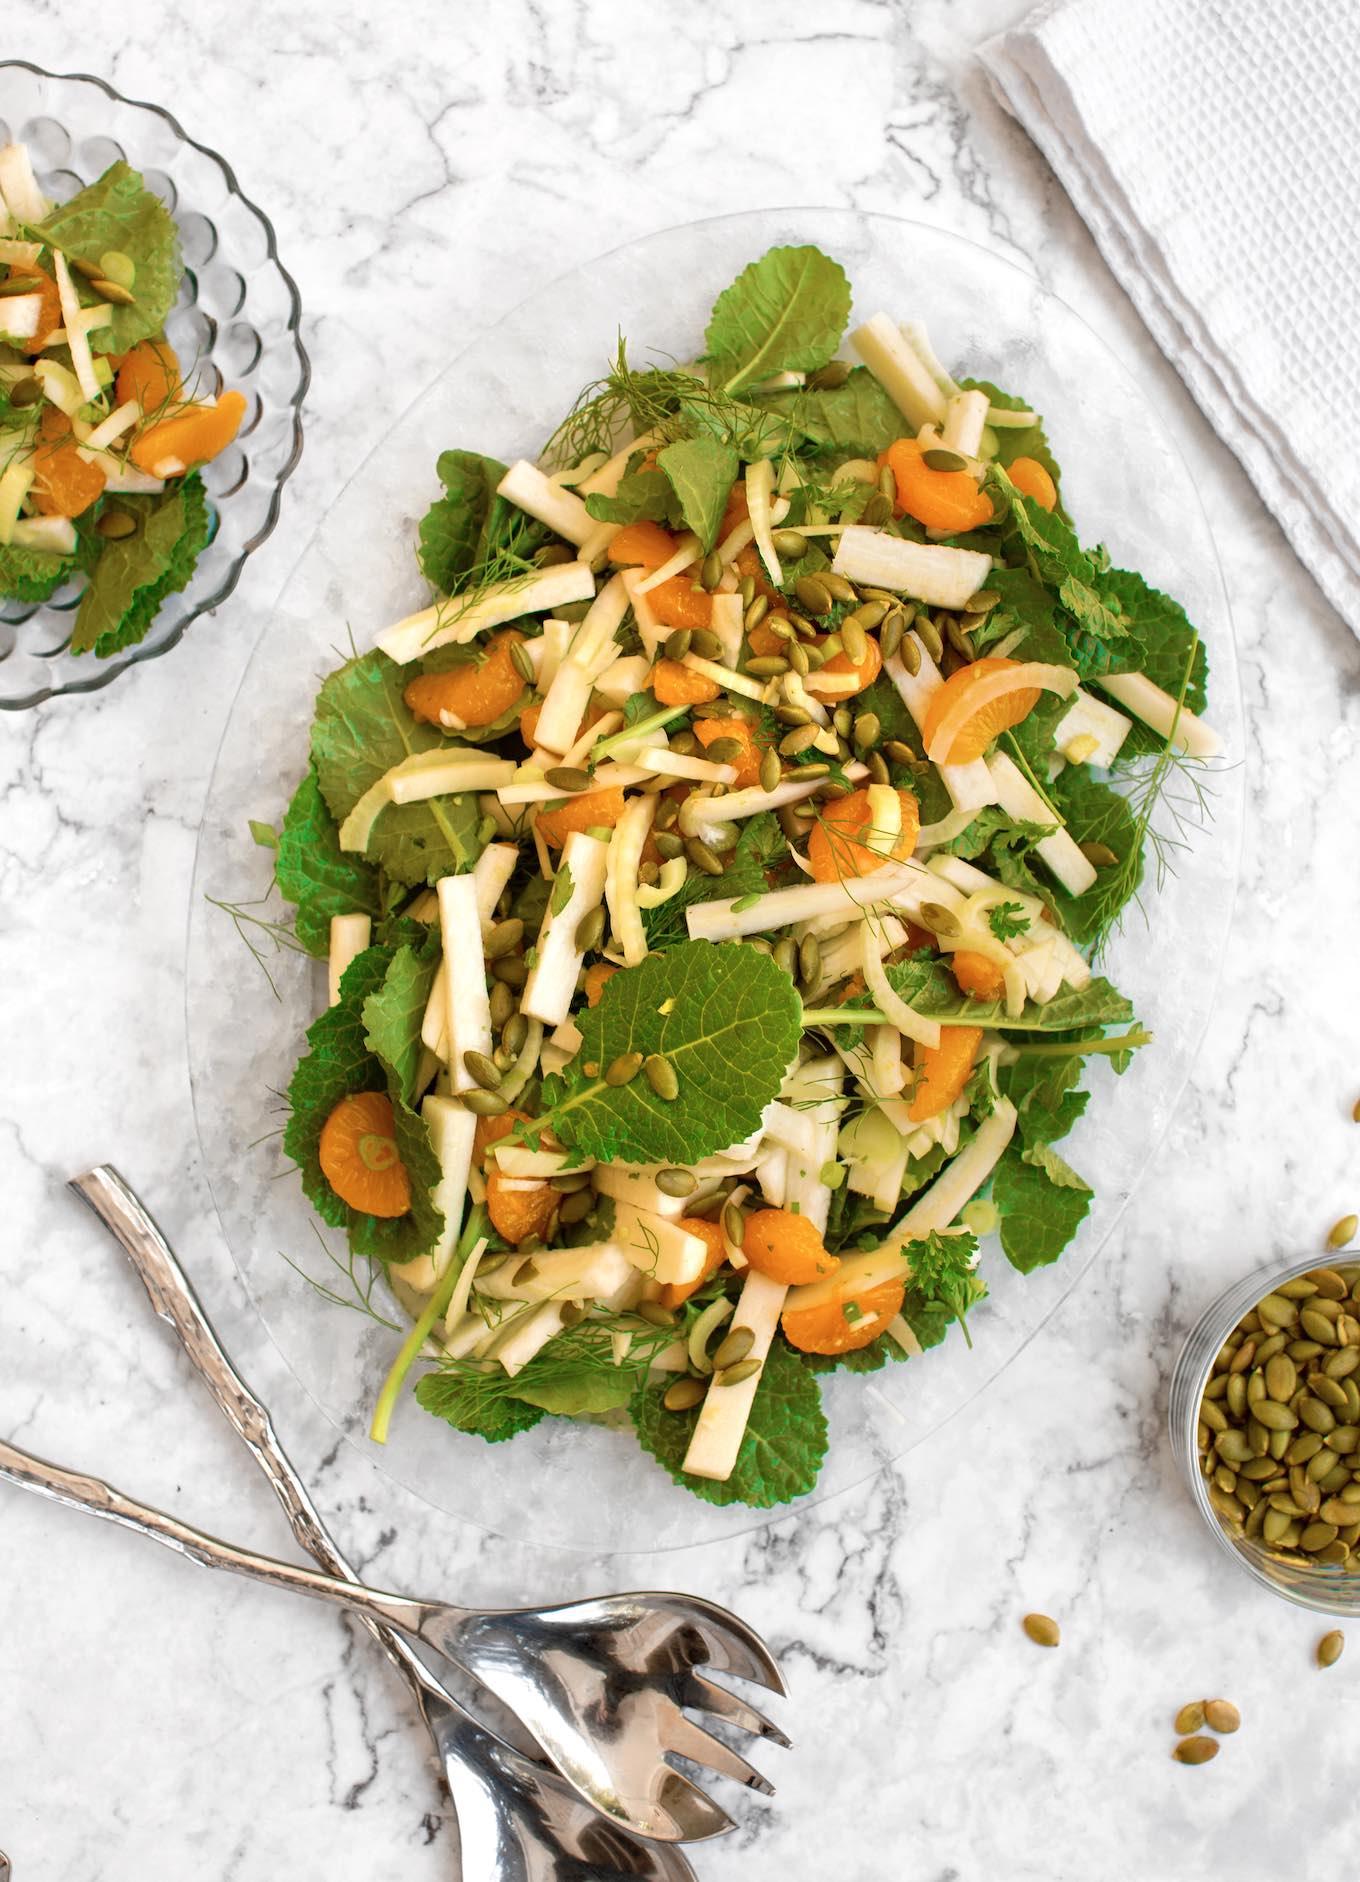 Jicama, fennel, & citrus salad